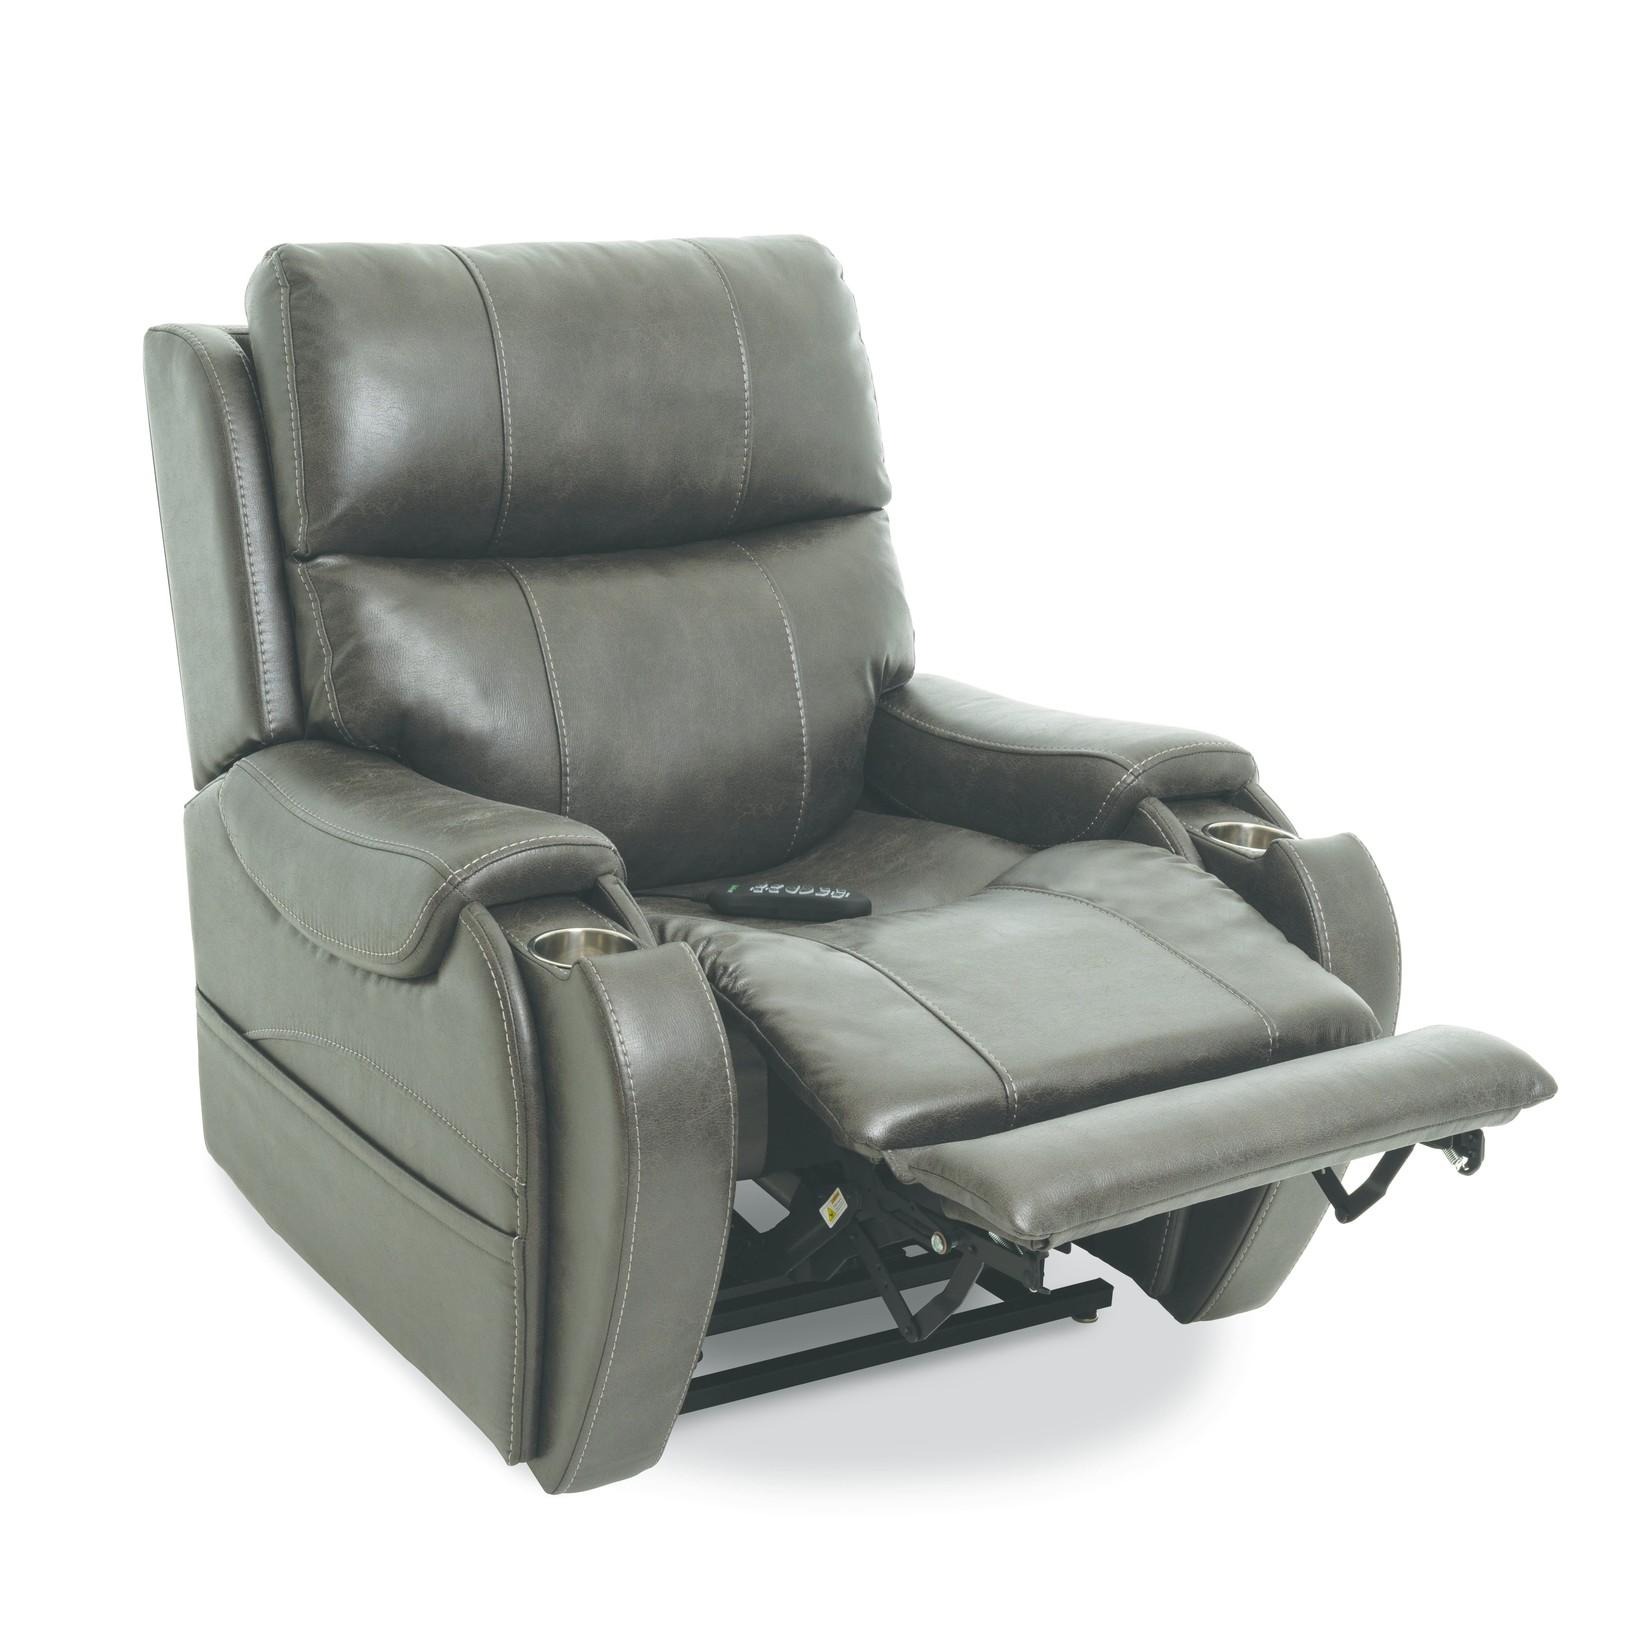 Pride Atlas Plus Lift Chair